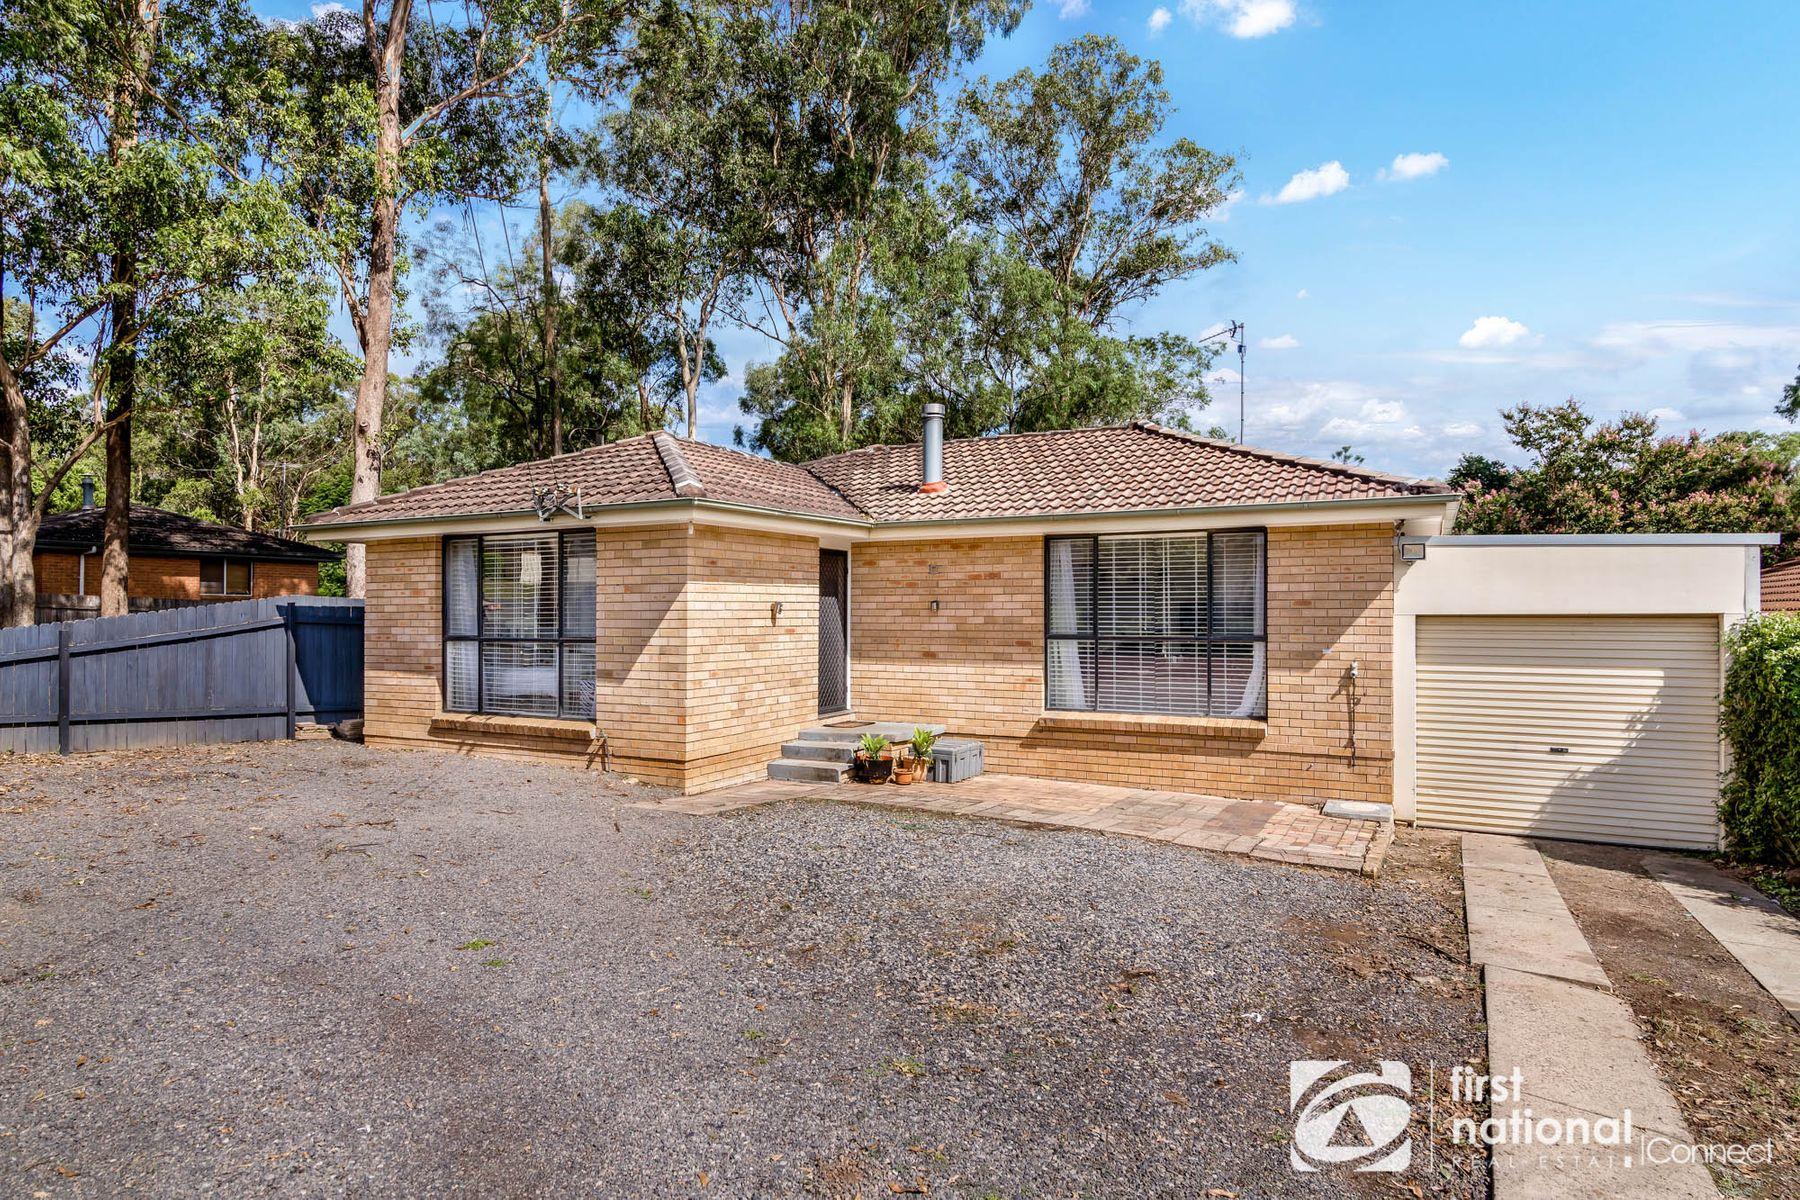 27 Ian Street, Glossodia, NSW 2756